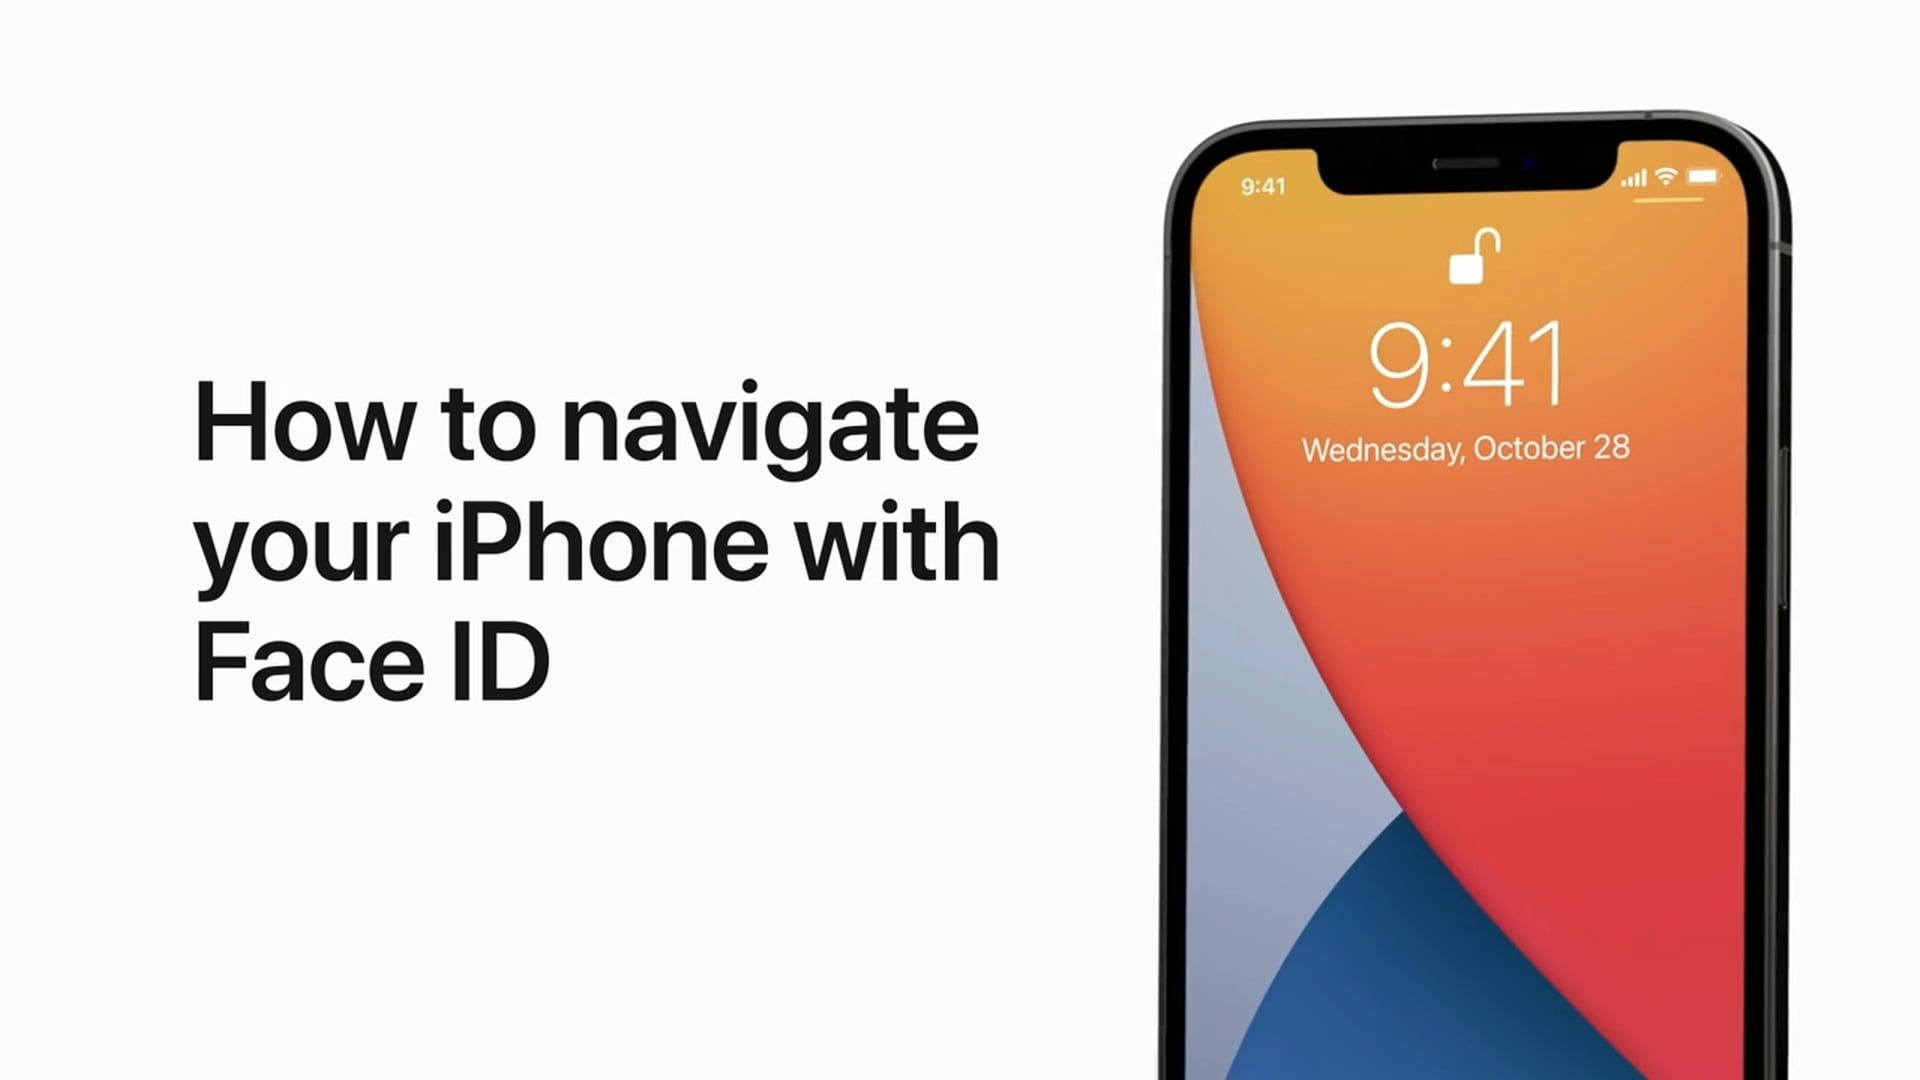 Poradnik Apple: Jak korzystać z iPhone'a z funkcją Face ID